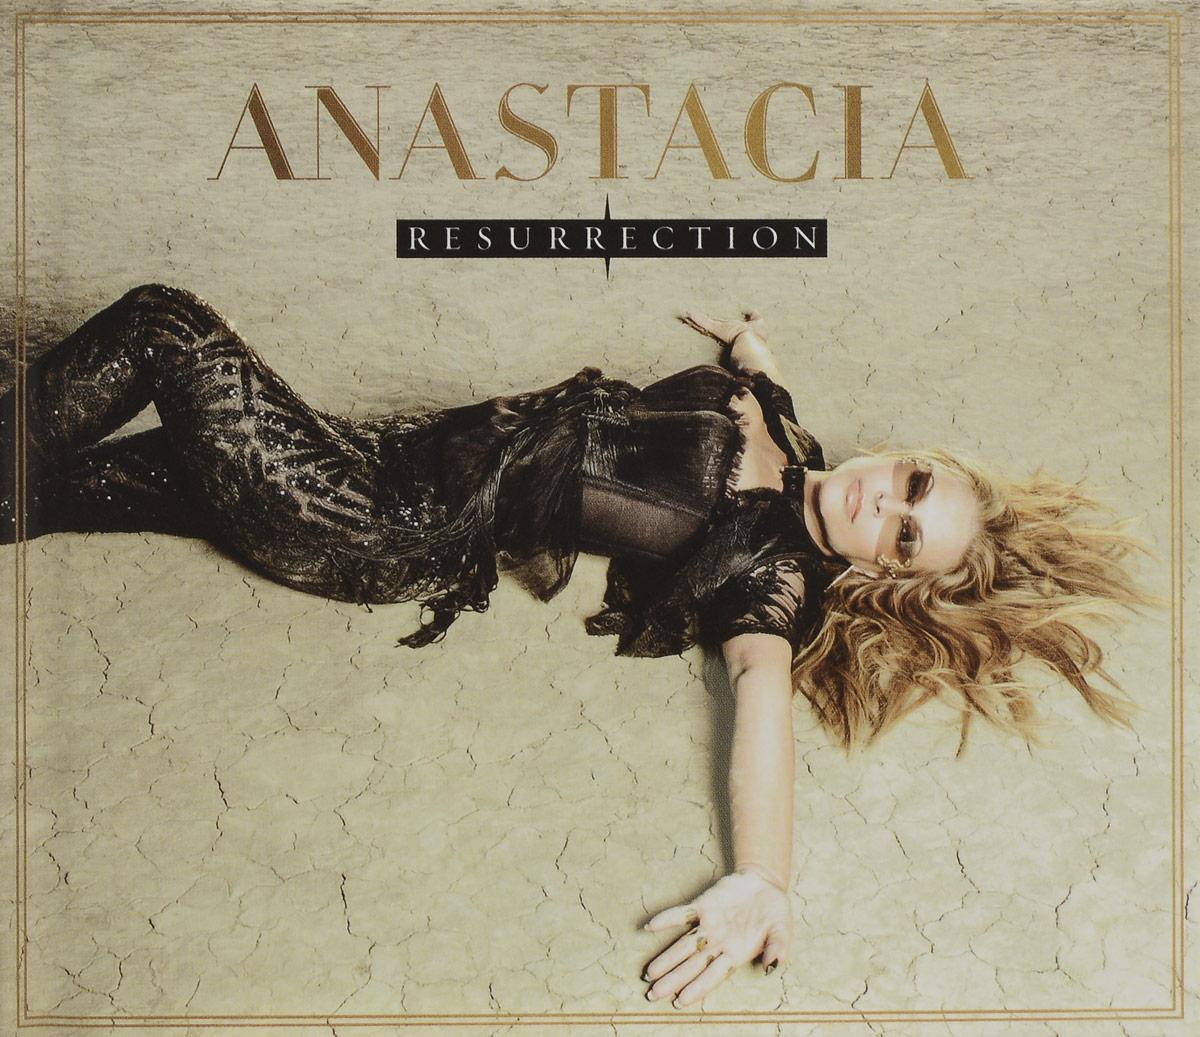 Анастасия Азеведо Anastacia. Resurrection (2 CD) цена